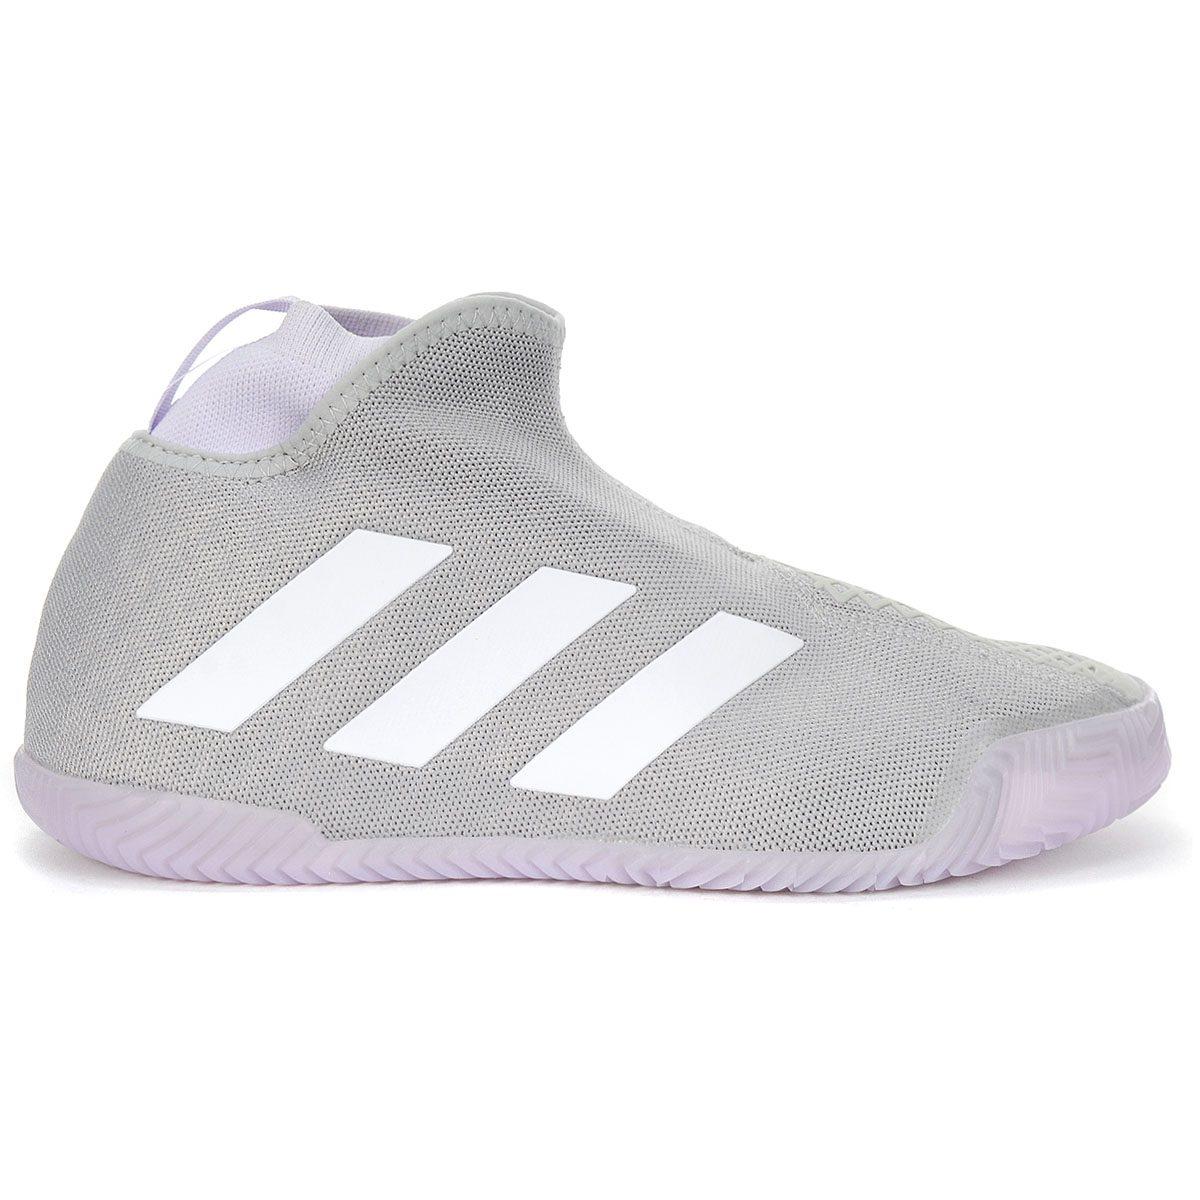 Adidas Women's Stycon Laceless Grey Two